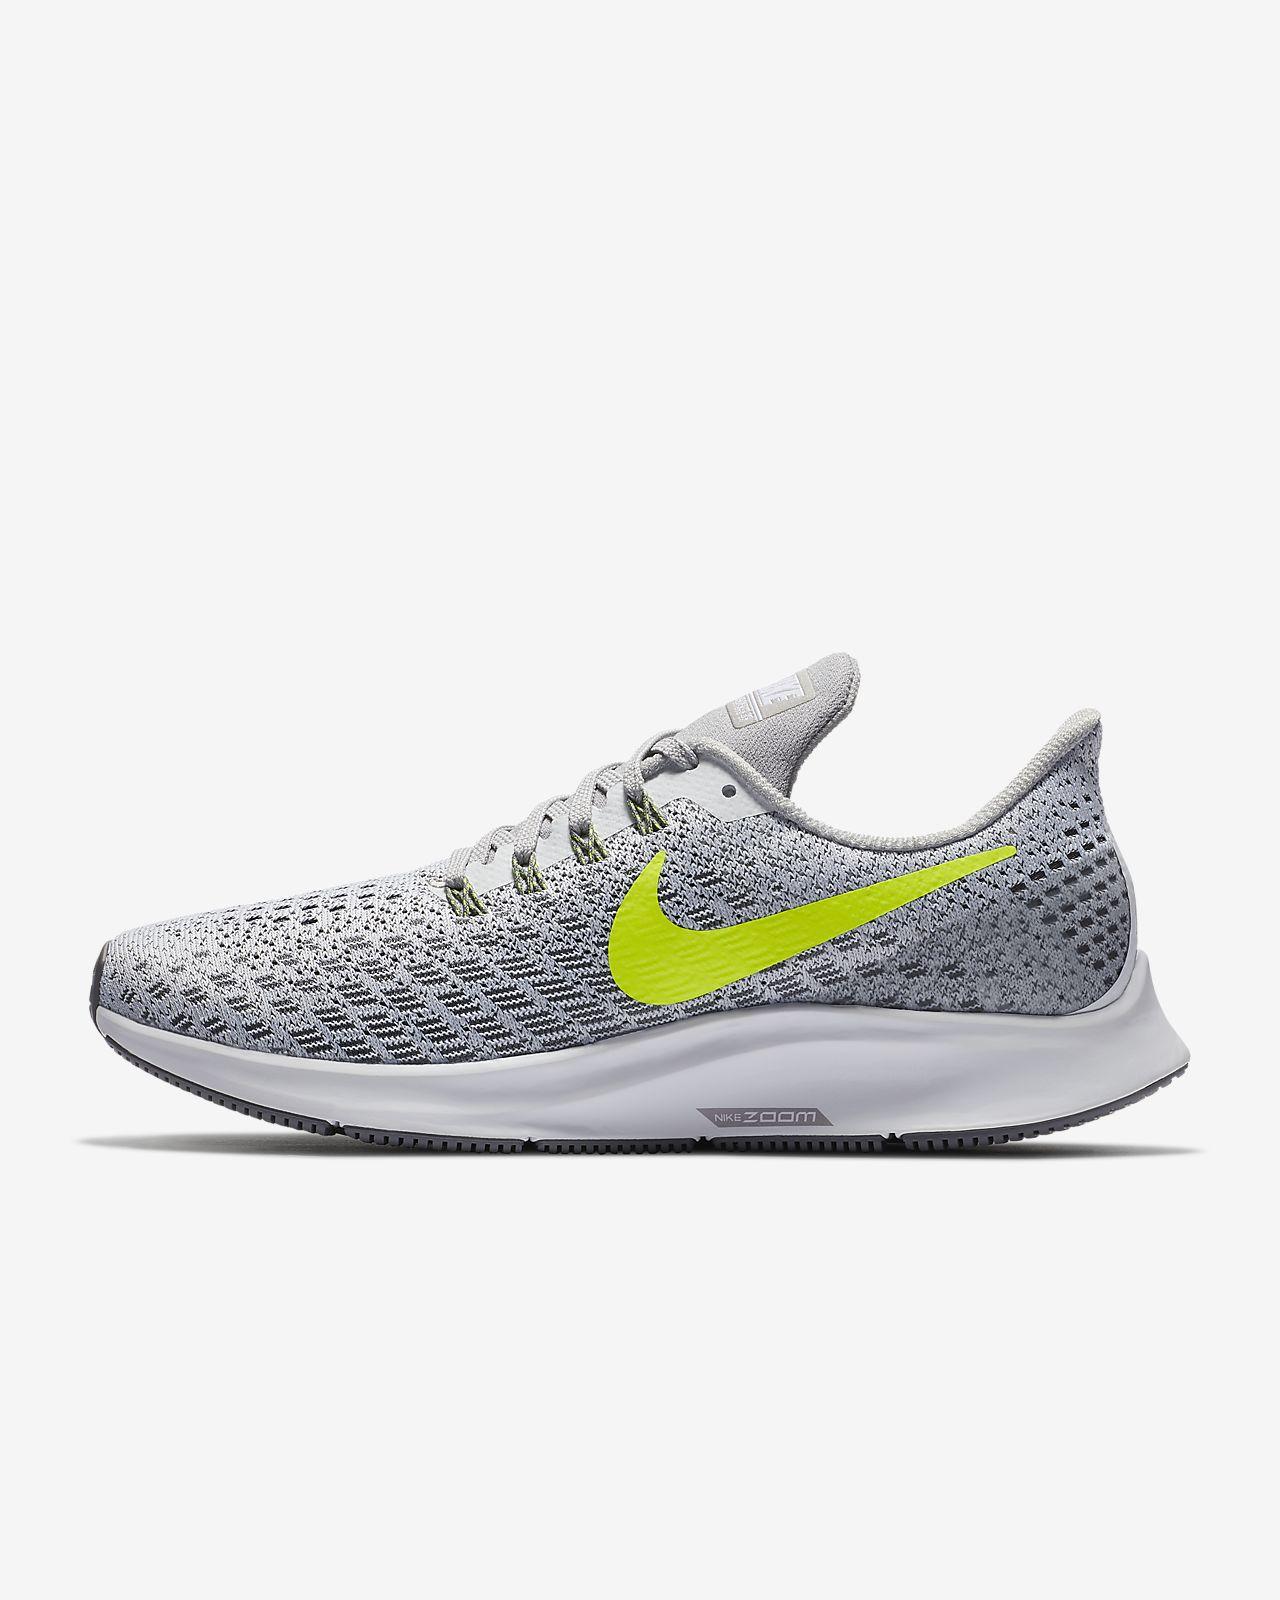 wholesale dealer eafee 18c77 Women s Running Shoe. Nike Air Zoom Pegasus 35